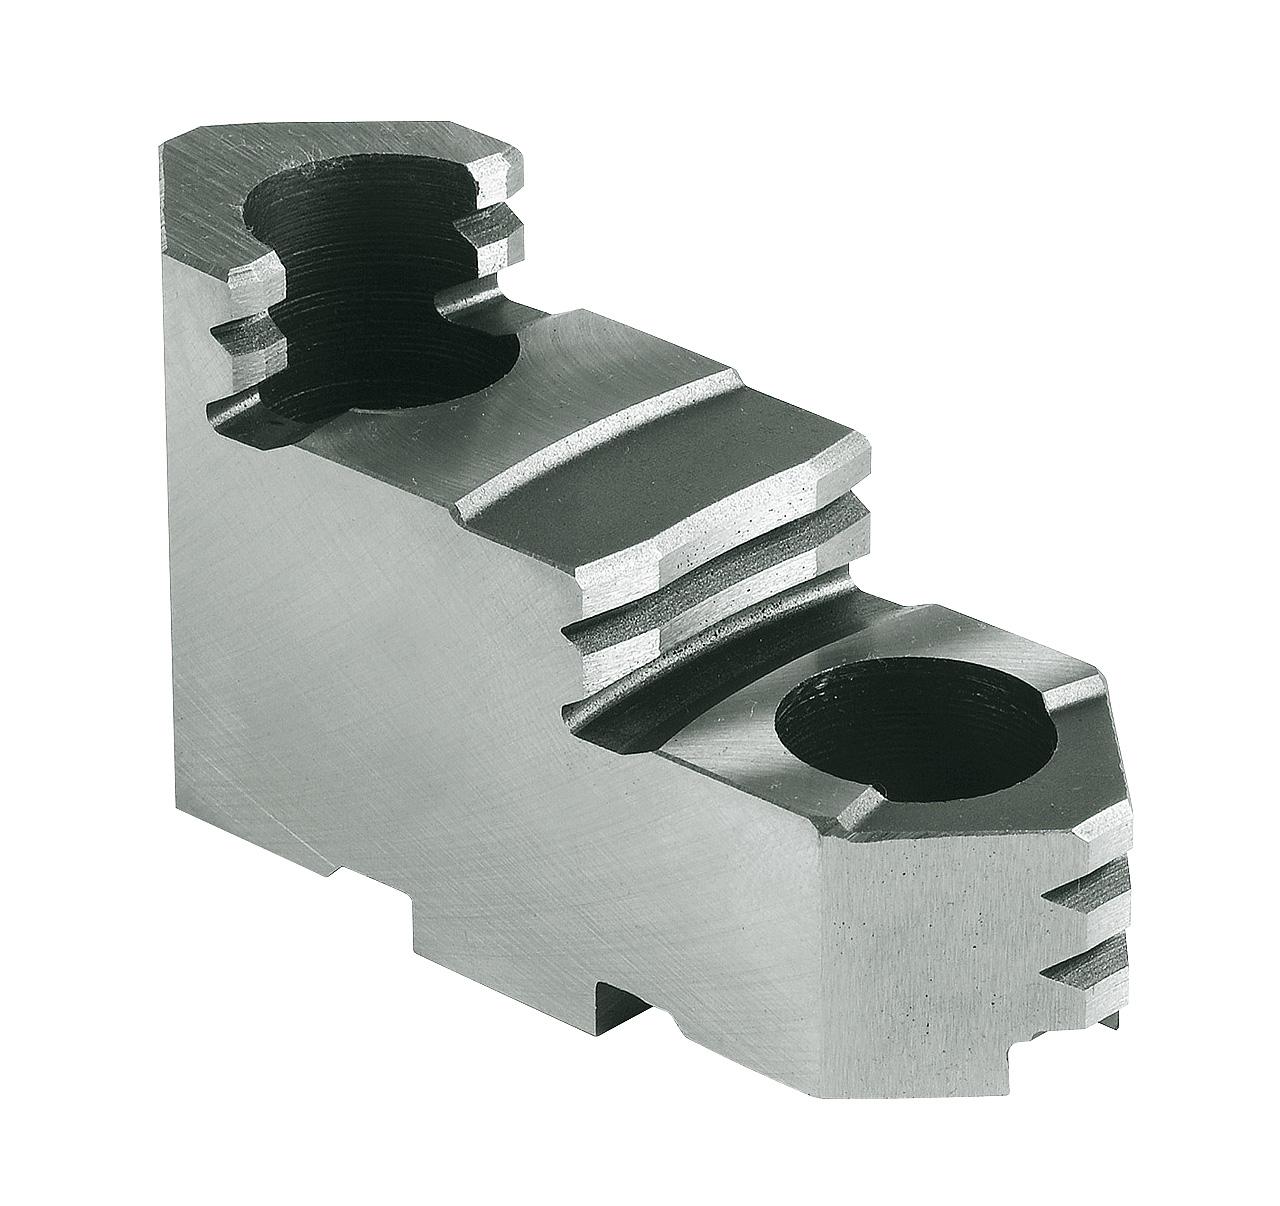 Szczęki górne twarde - komplet TJ-PS3-500 BERNARDO